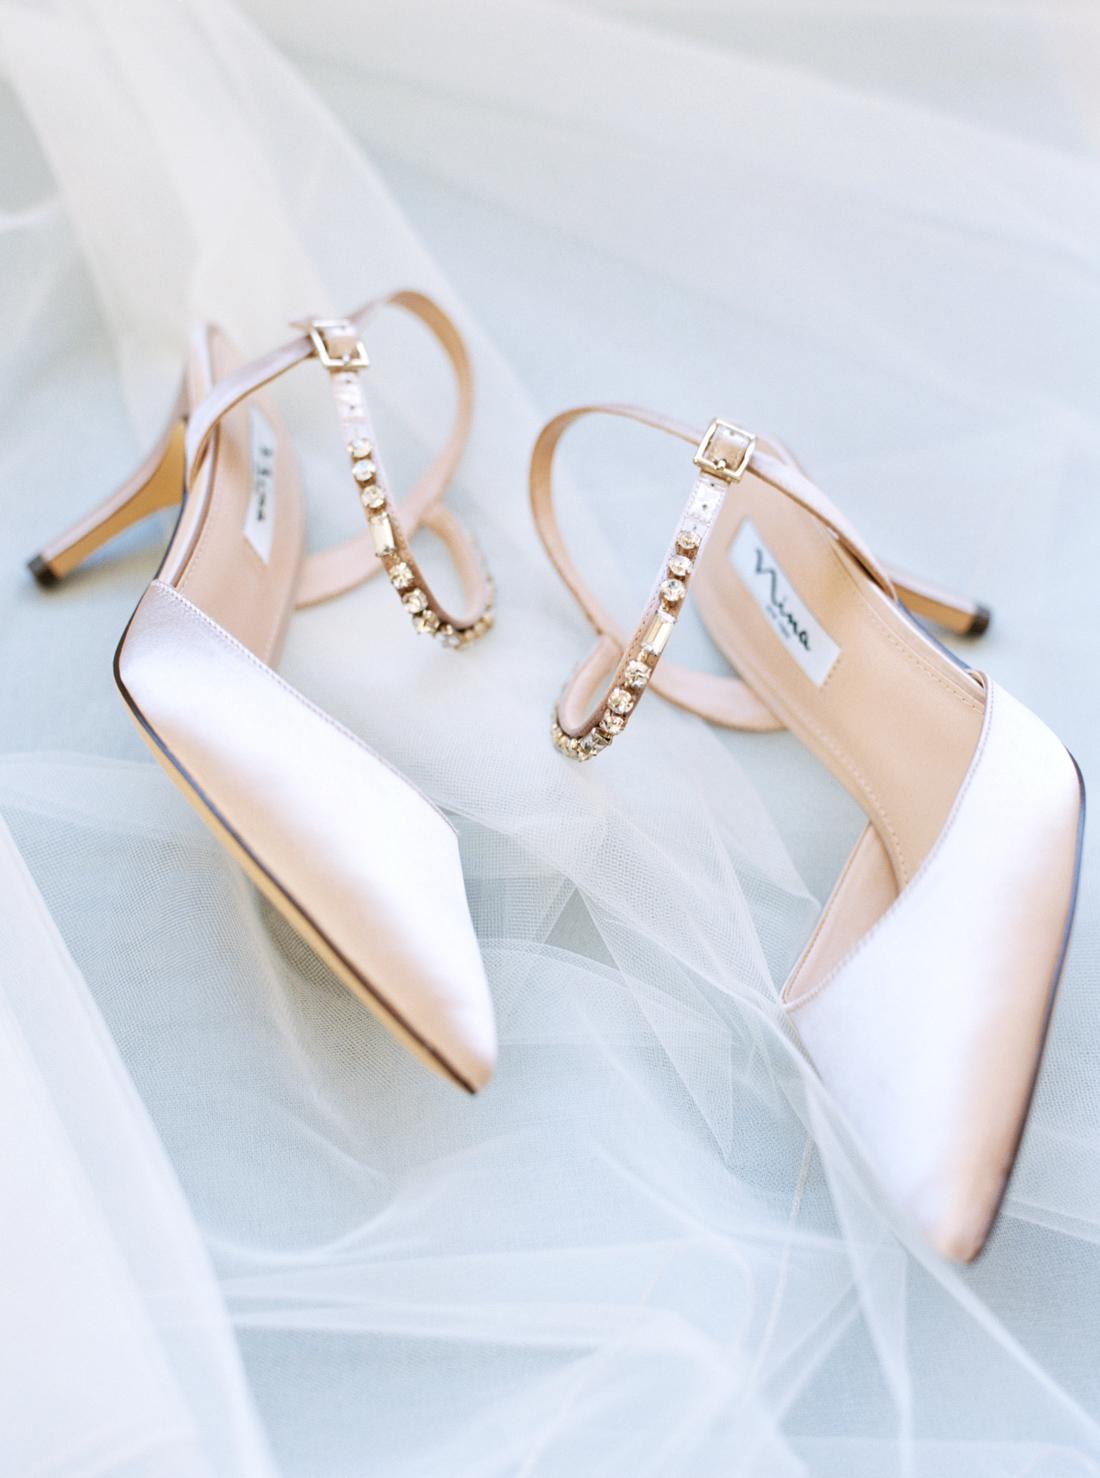 Nina-bridal-wedding-shoes